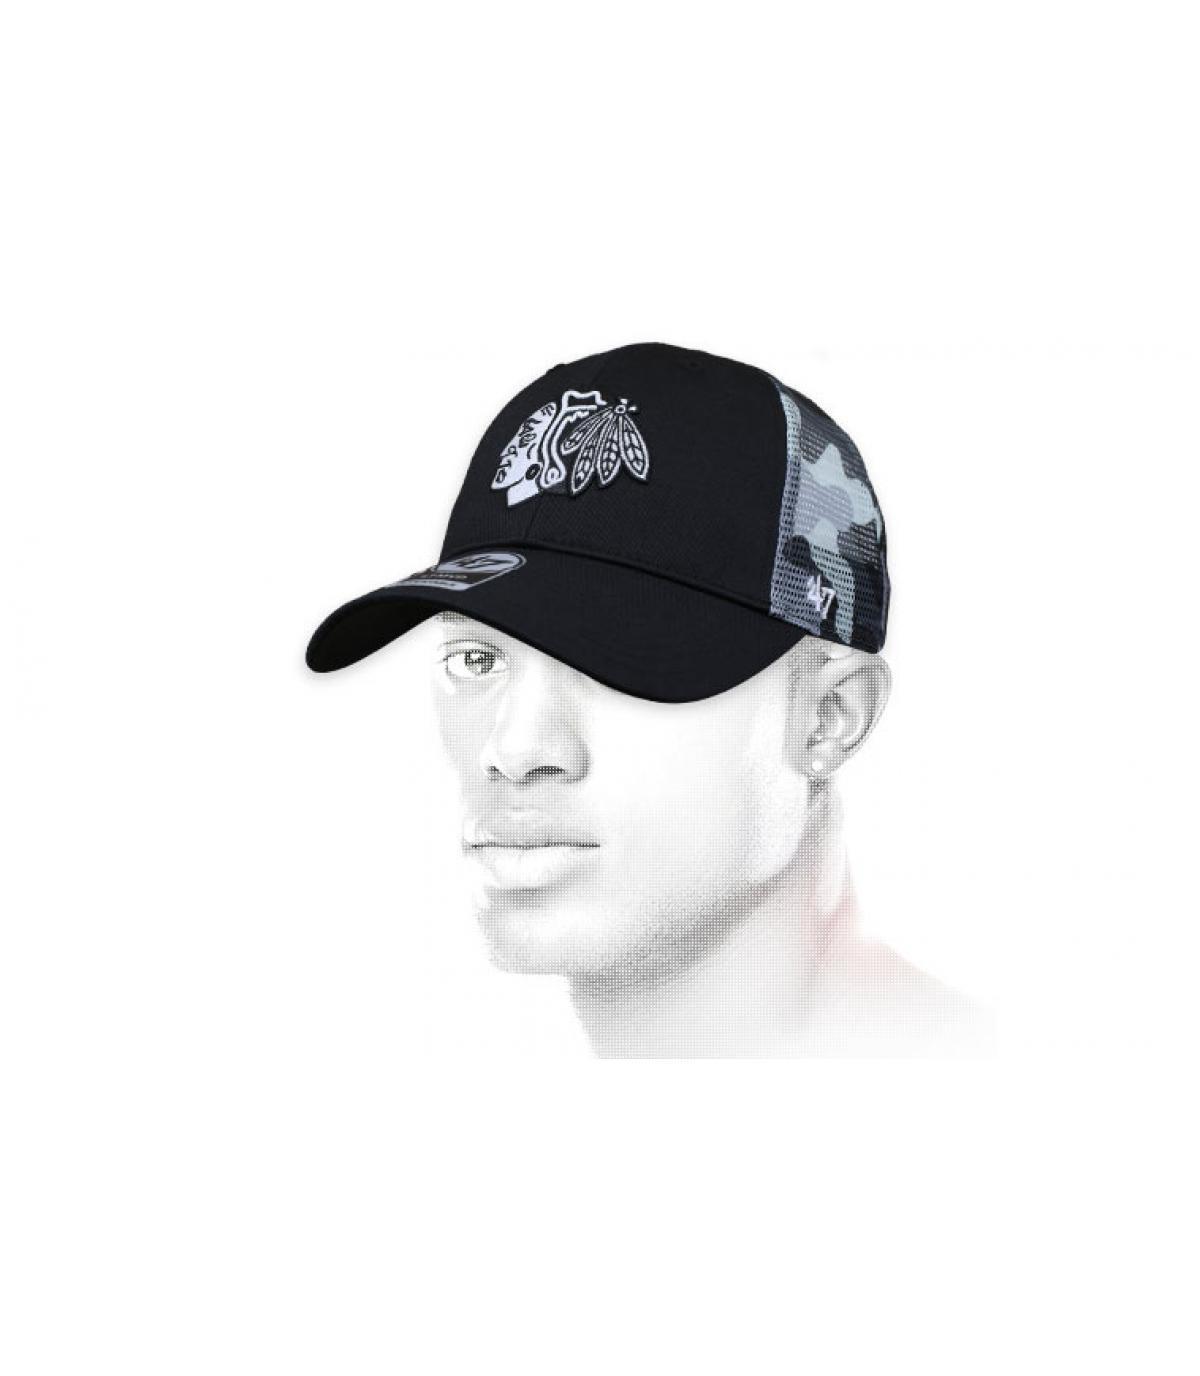 Cappellino mimetico nero Blackhawks